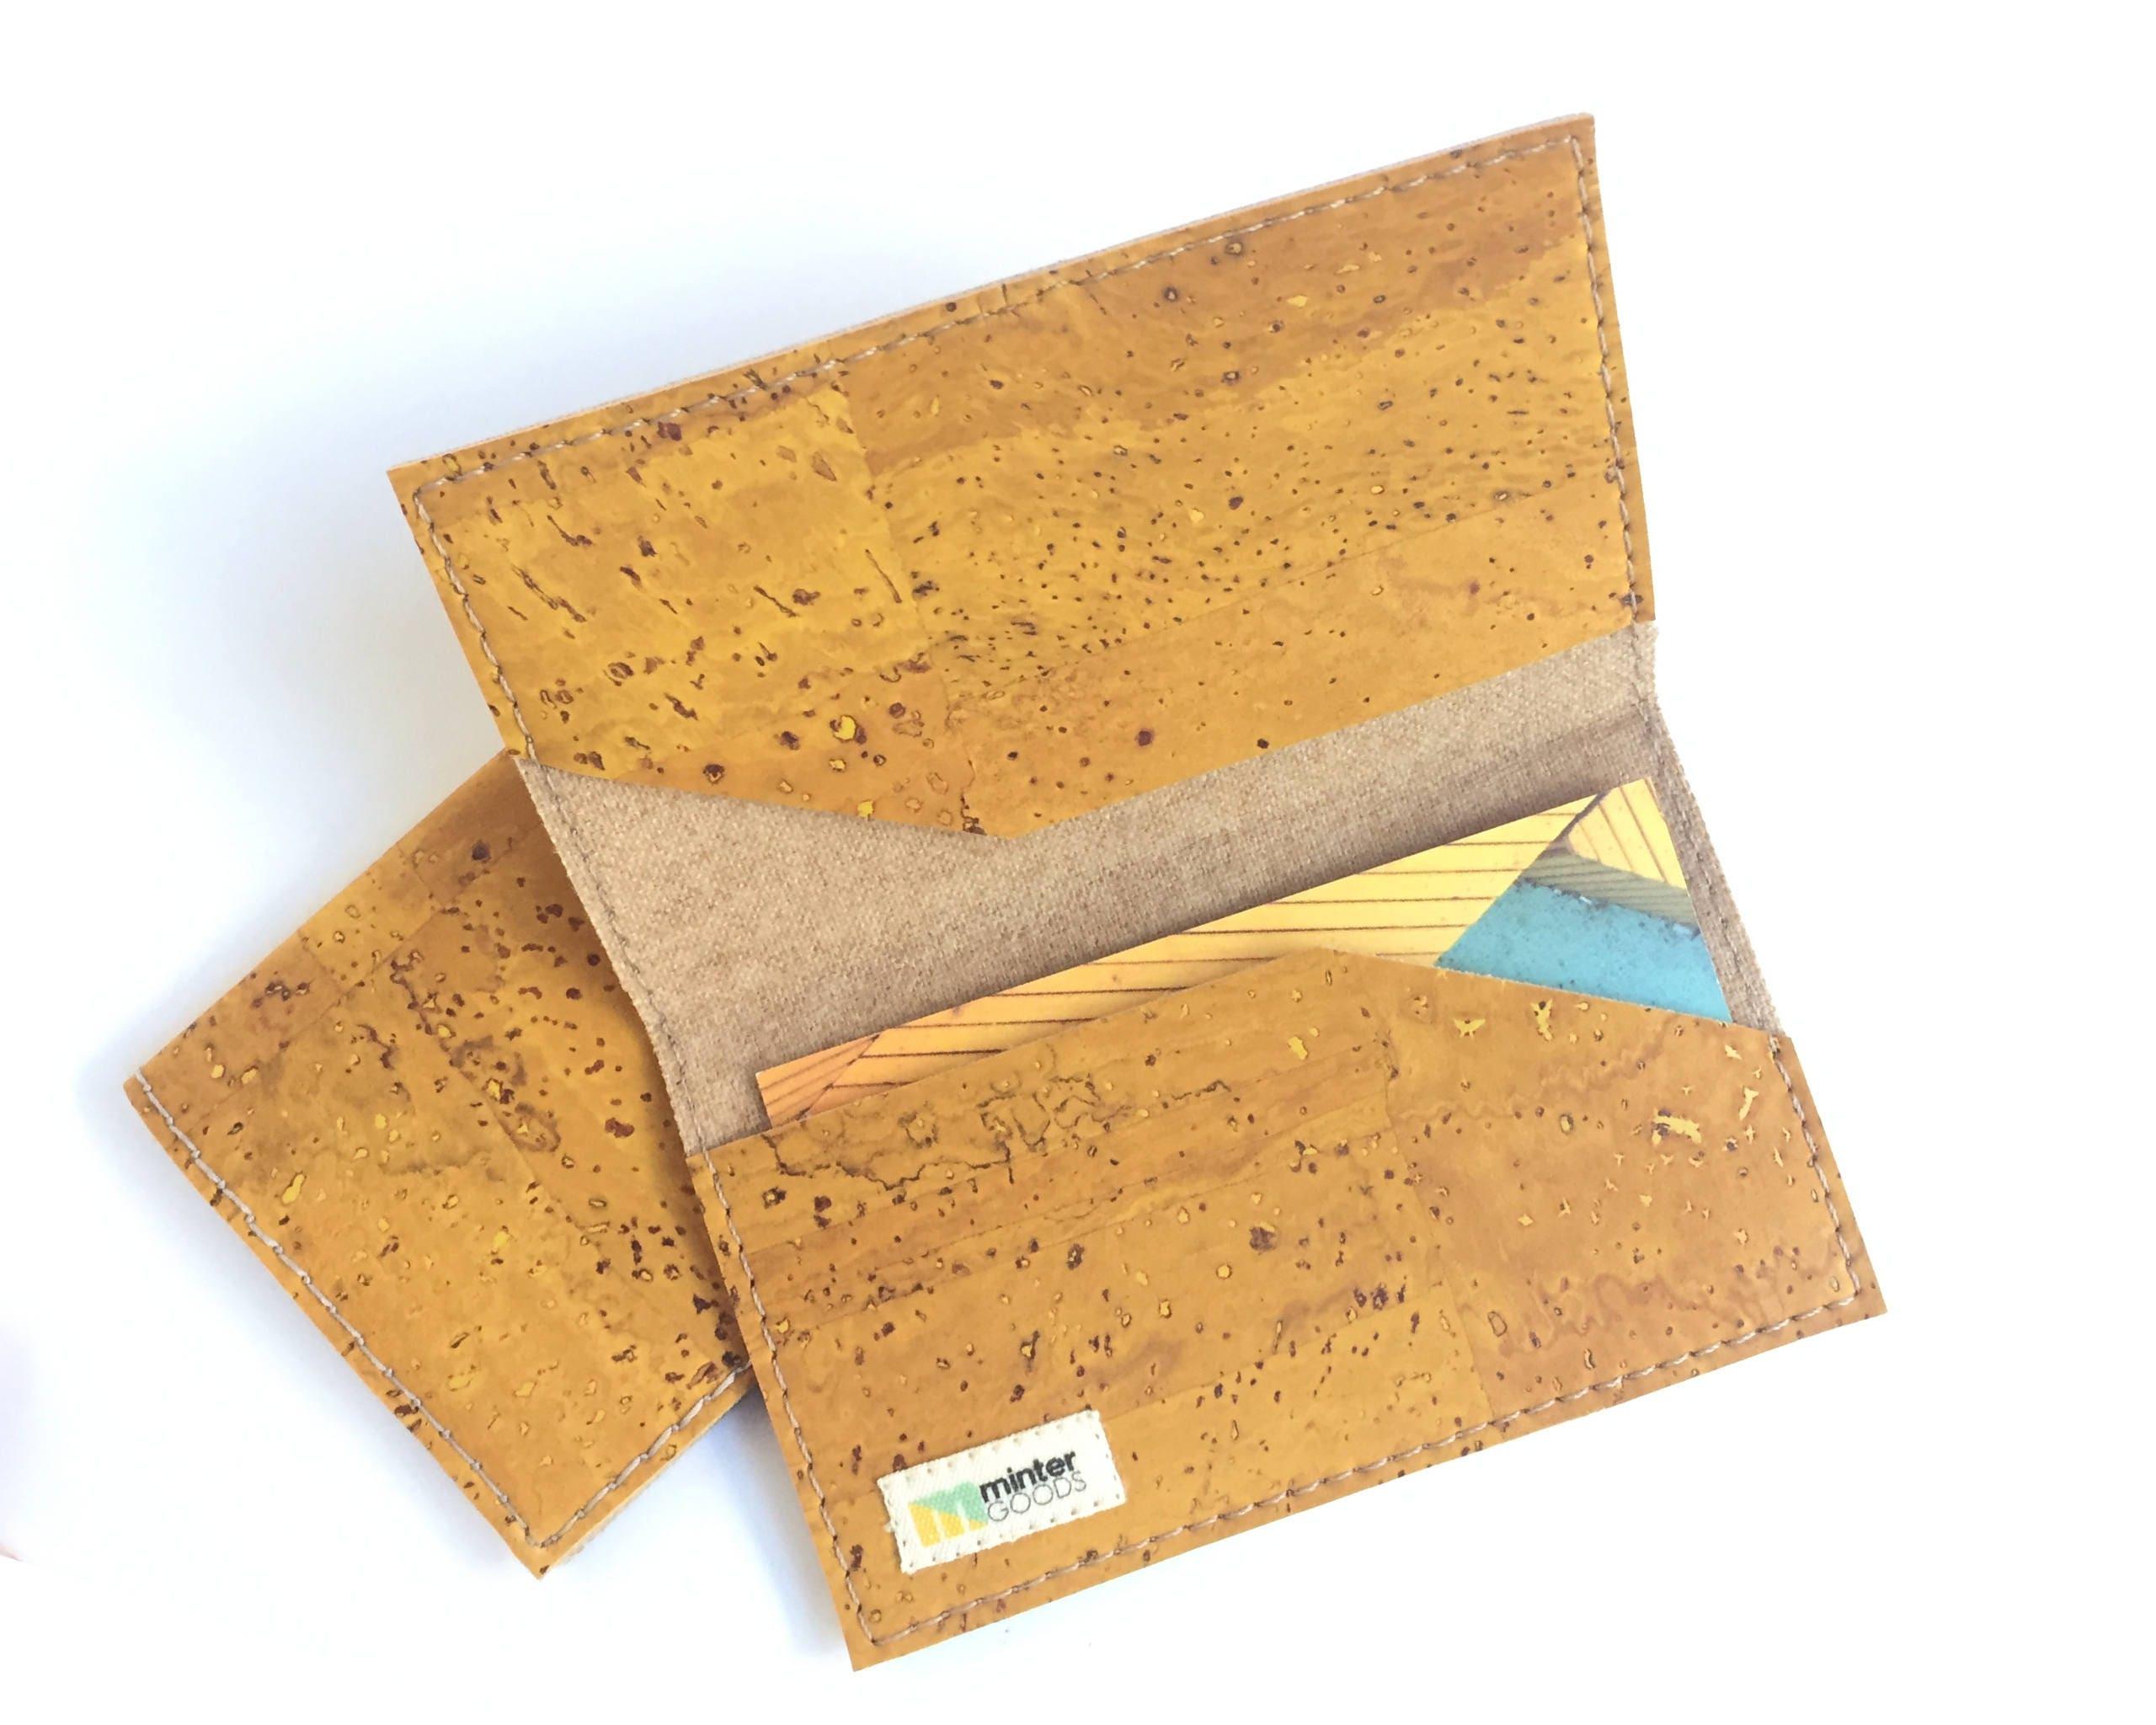 Cork card case mustard yellow cork fabric business card case card cork card case mustard yellow cork fabric business card case card holder colourmoves Choice Image